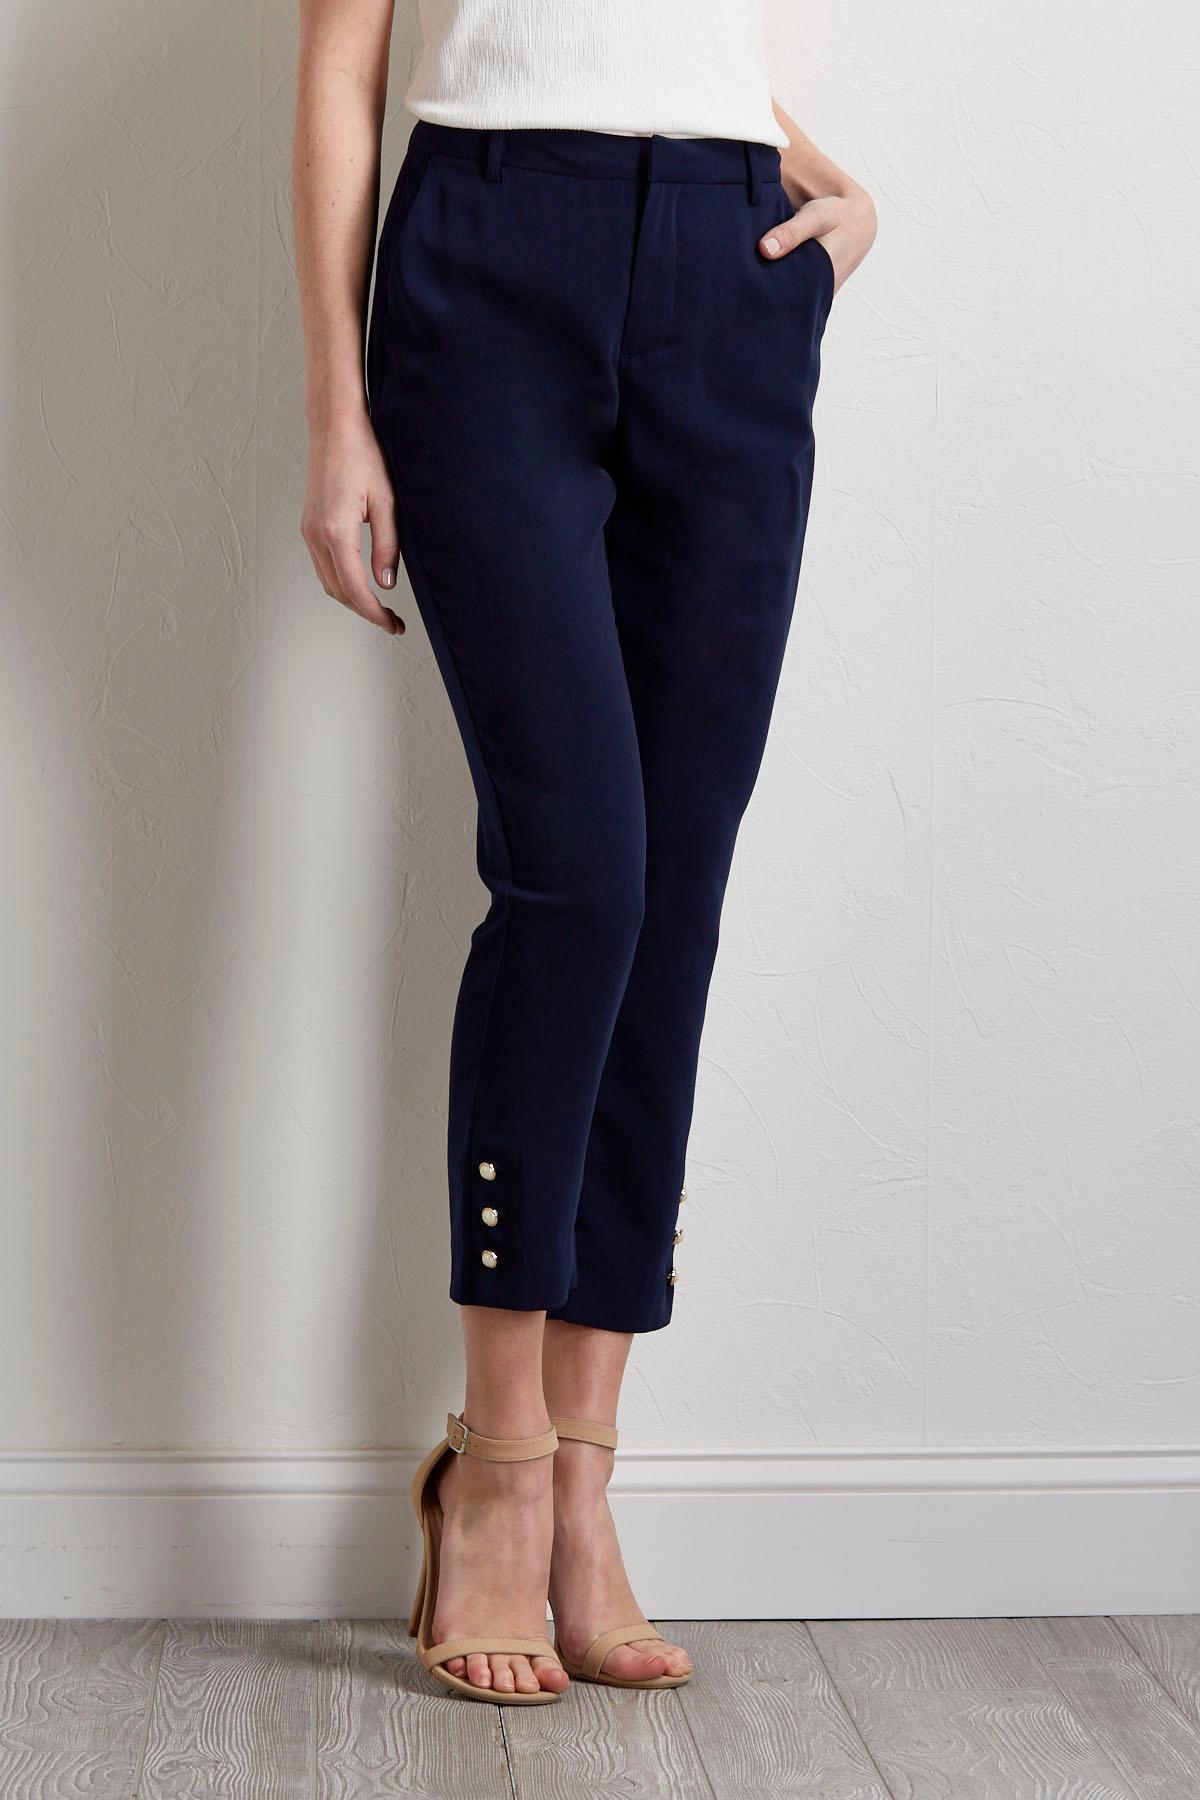 Embellished Cropped Skinny Pants